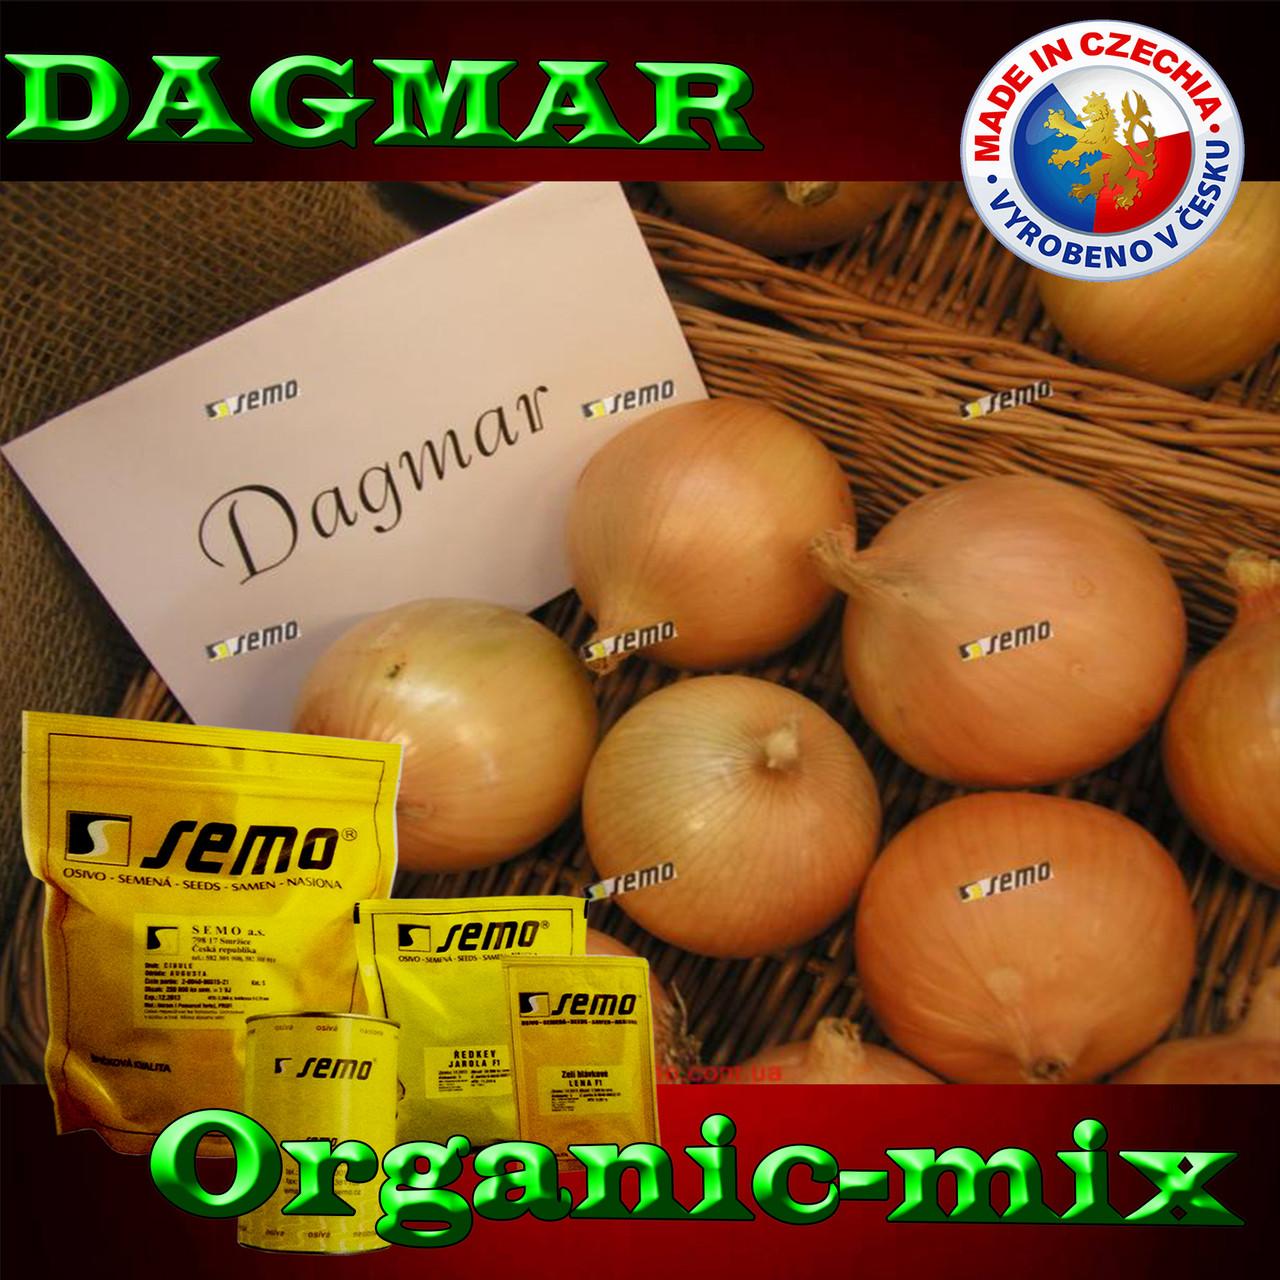 Семена, Лук Дагмар, ТМ SEMO (Чехия), 500 грамм, проф.пакет